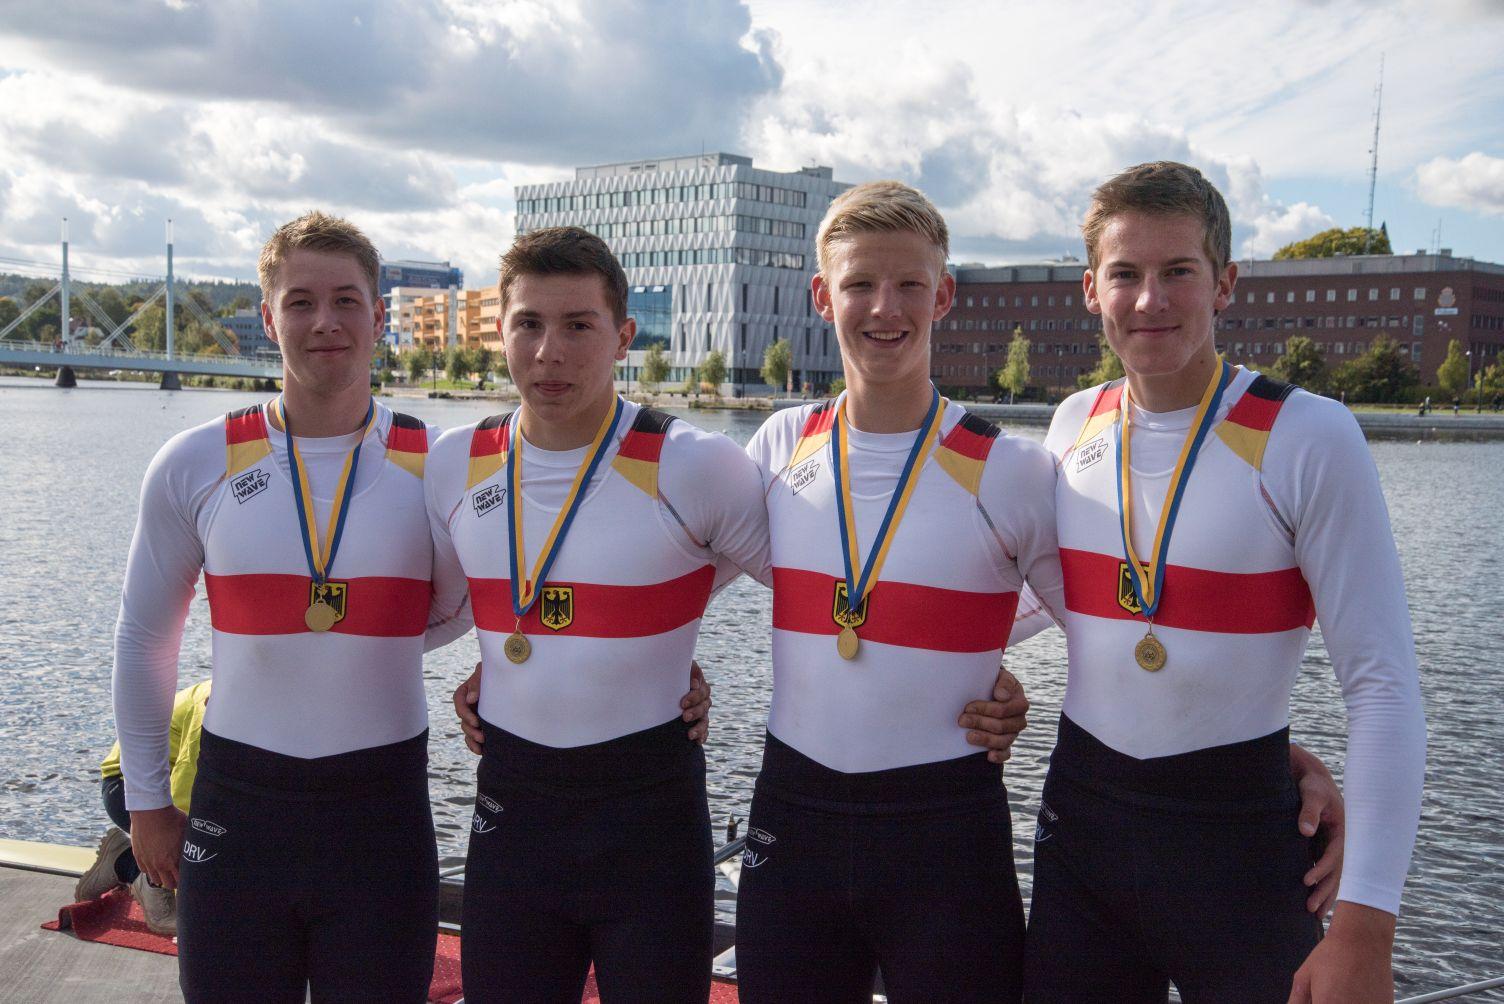 Felix Wüst Doppelsieger auf dem Baltic Cup in Schweden